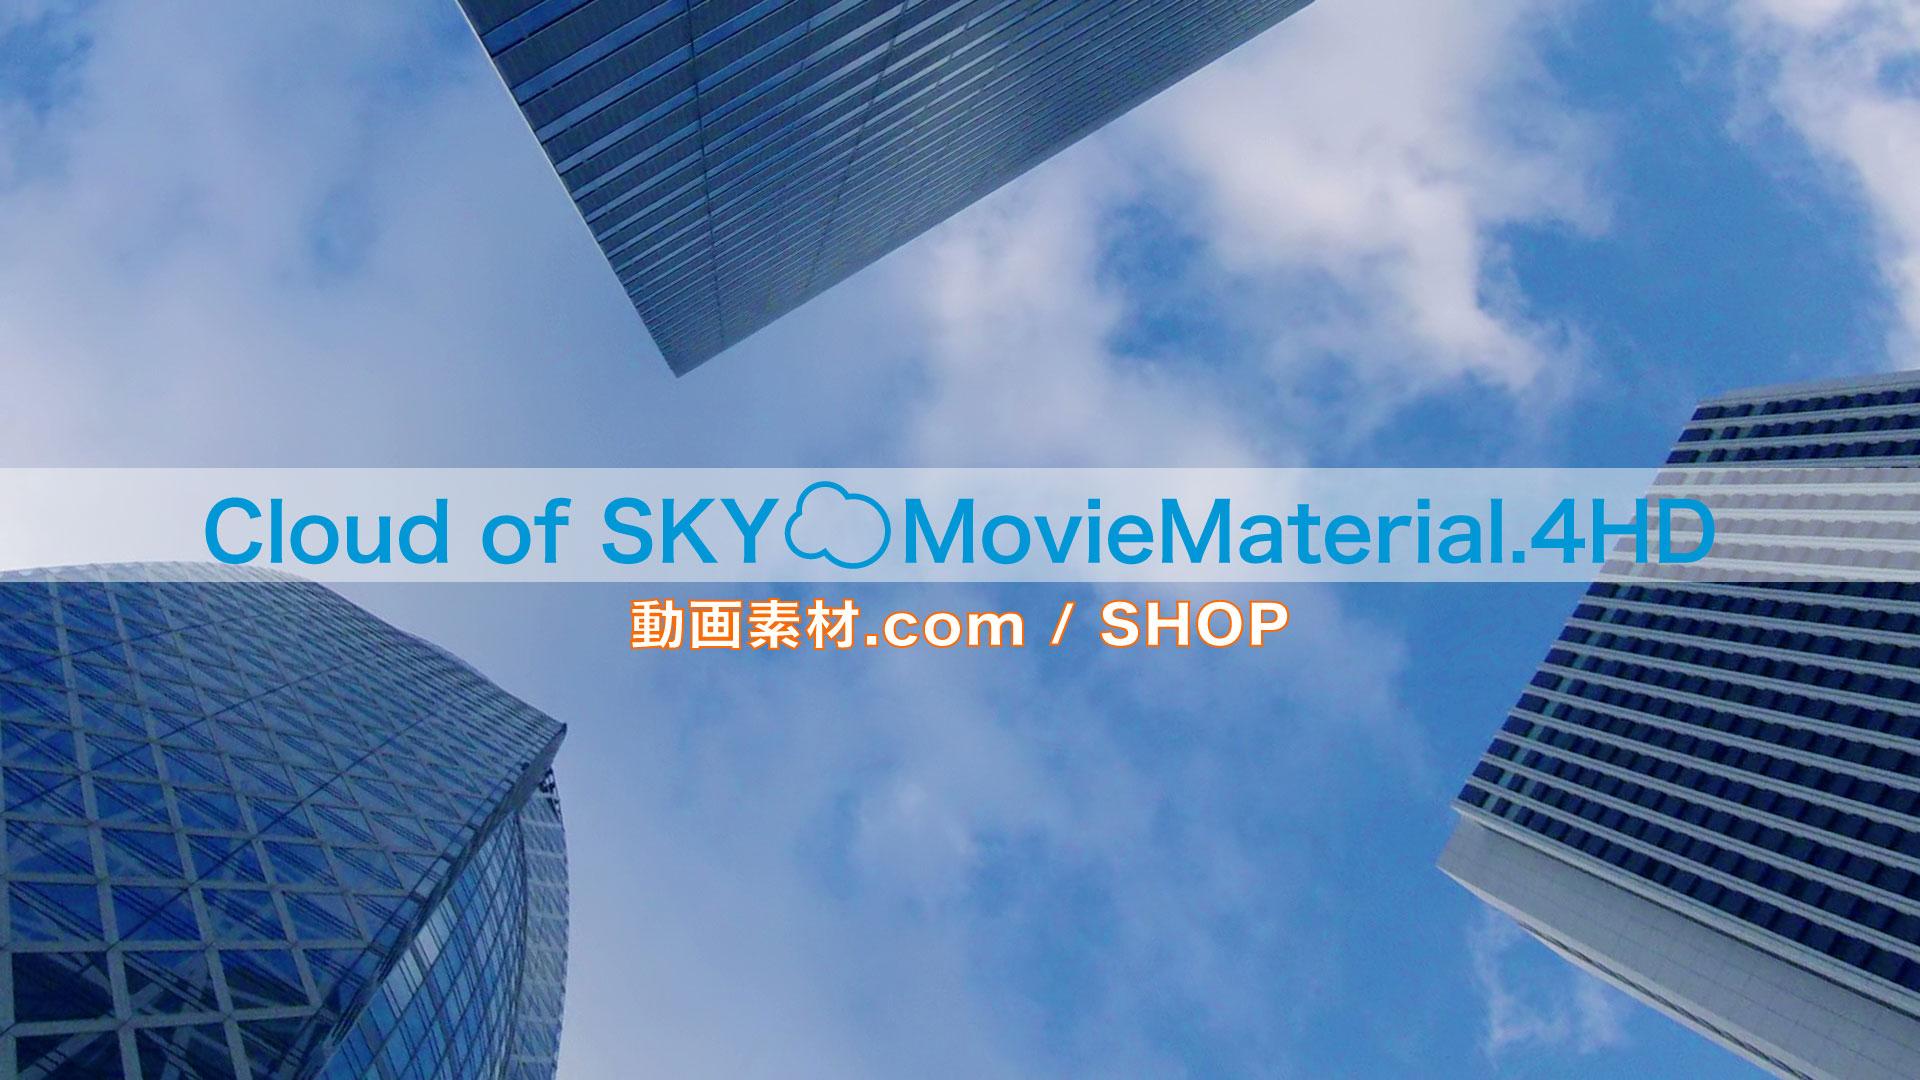 Cloud of SKY MovieMaterial.4HD 空と雲フルハイビジョン1920×1080p映像素材集image2